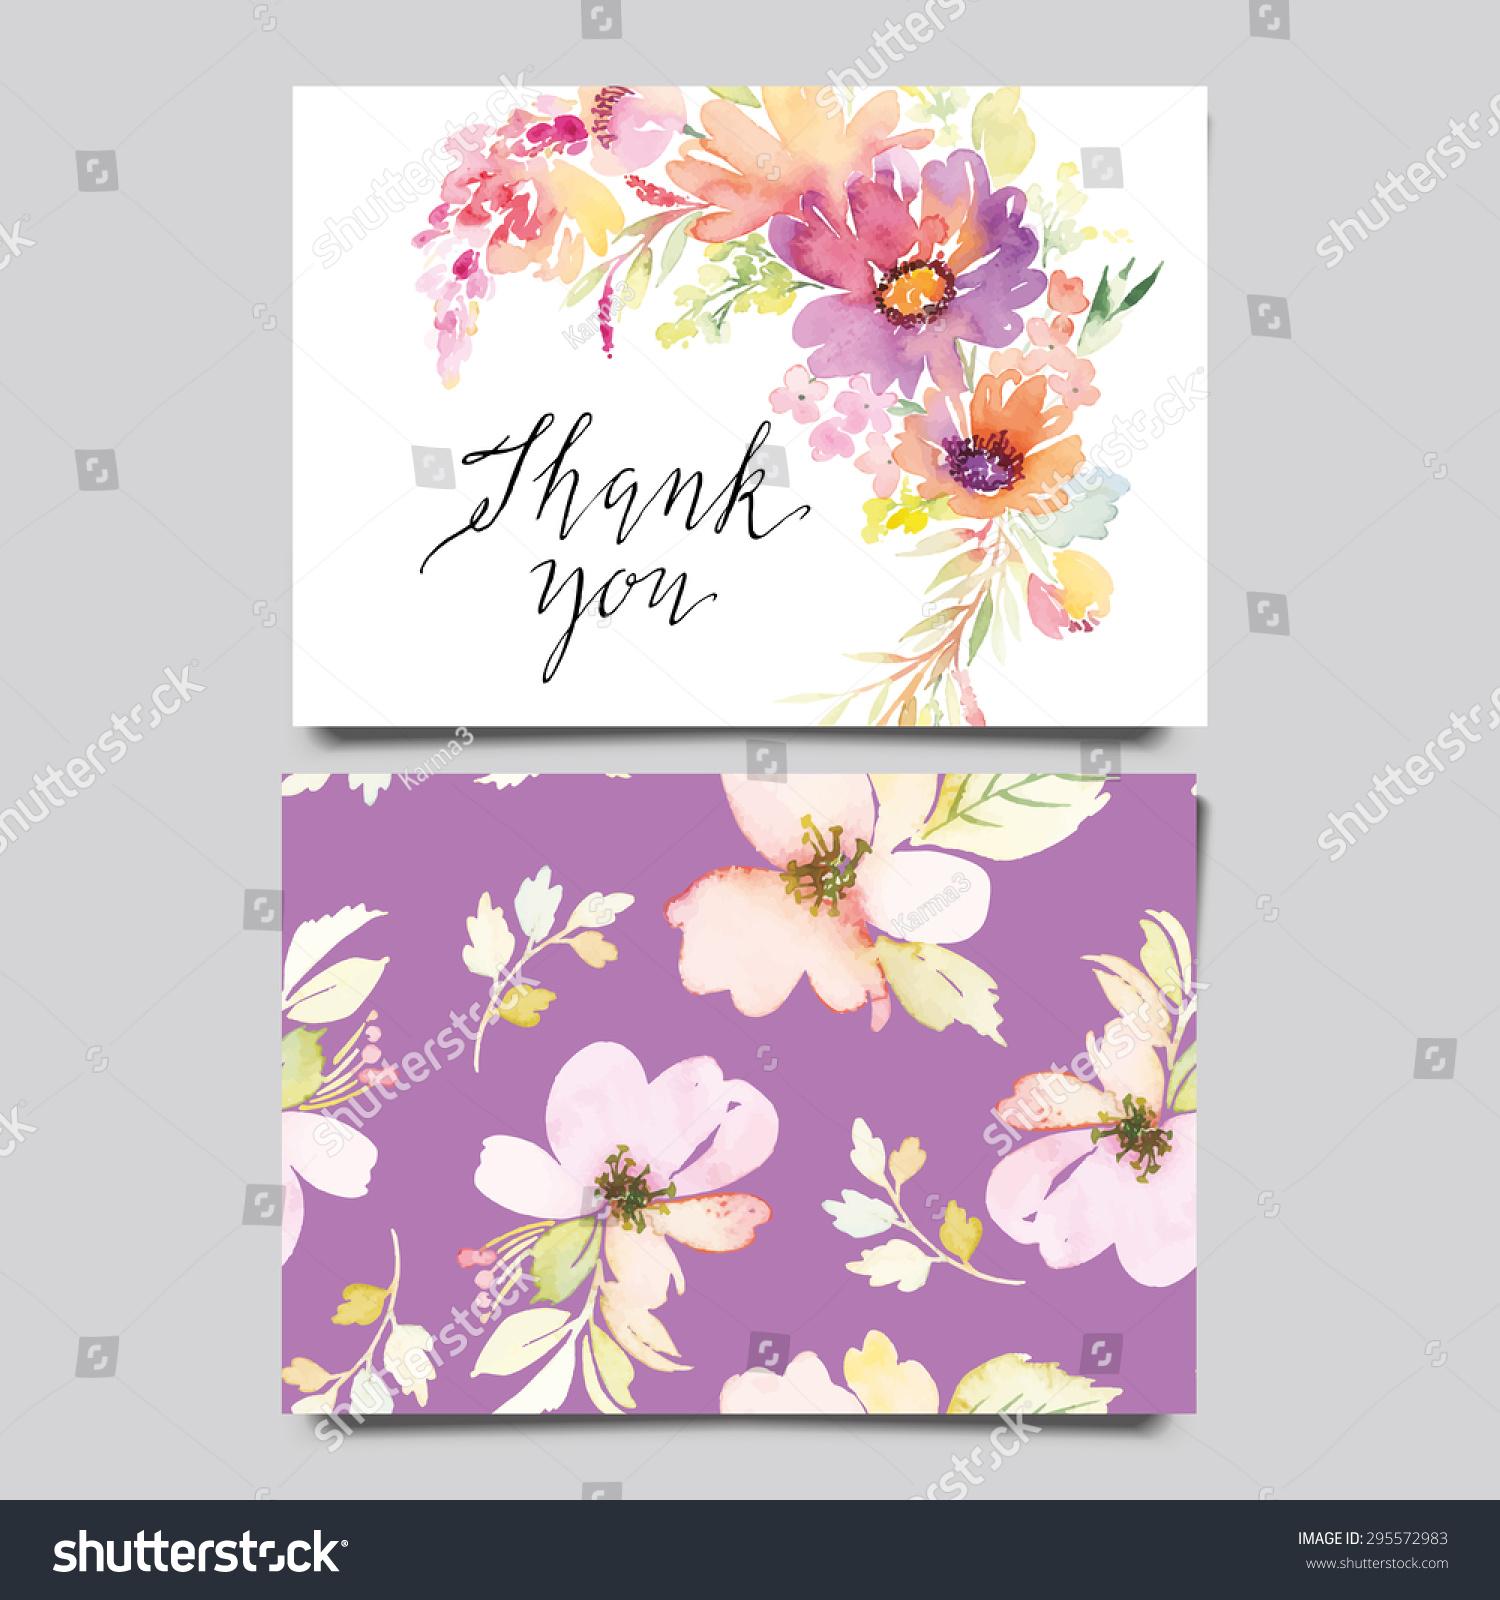 Watercolor Greeting Card Flowers Handmade Congratulations Stock